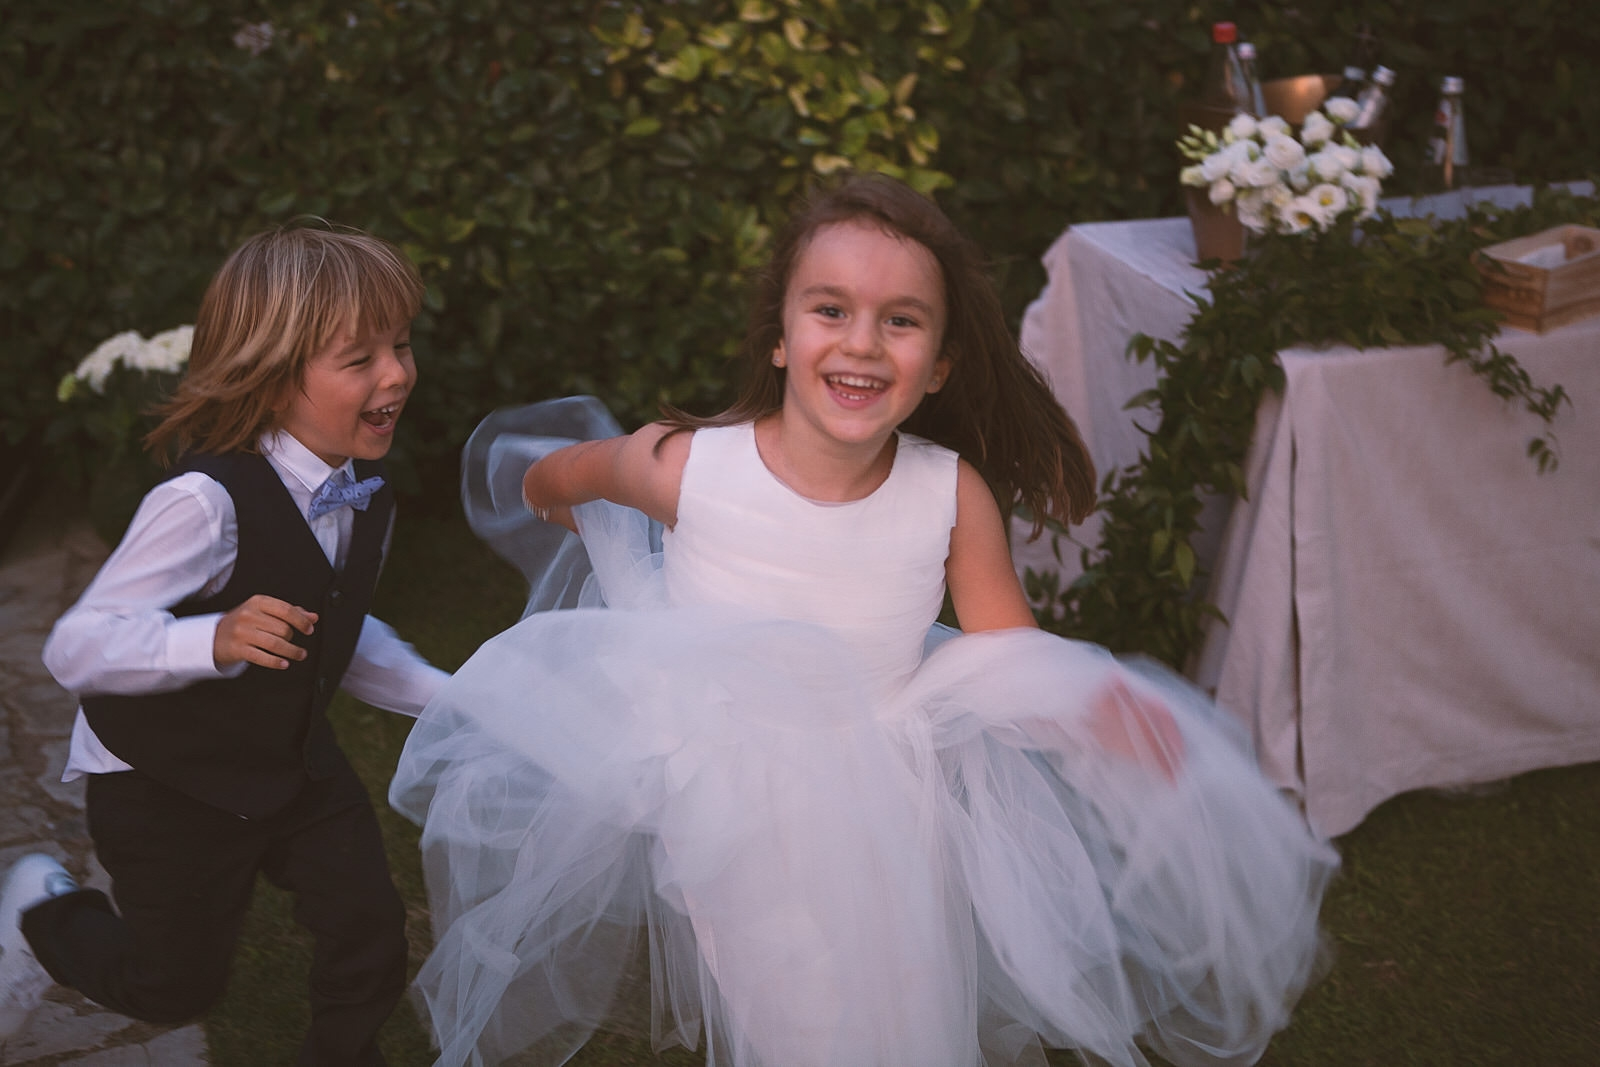 bambini gioco matrimonio stile